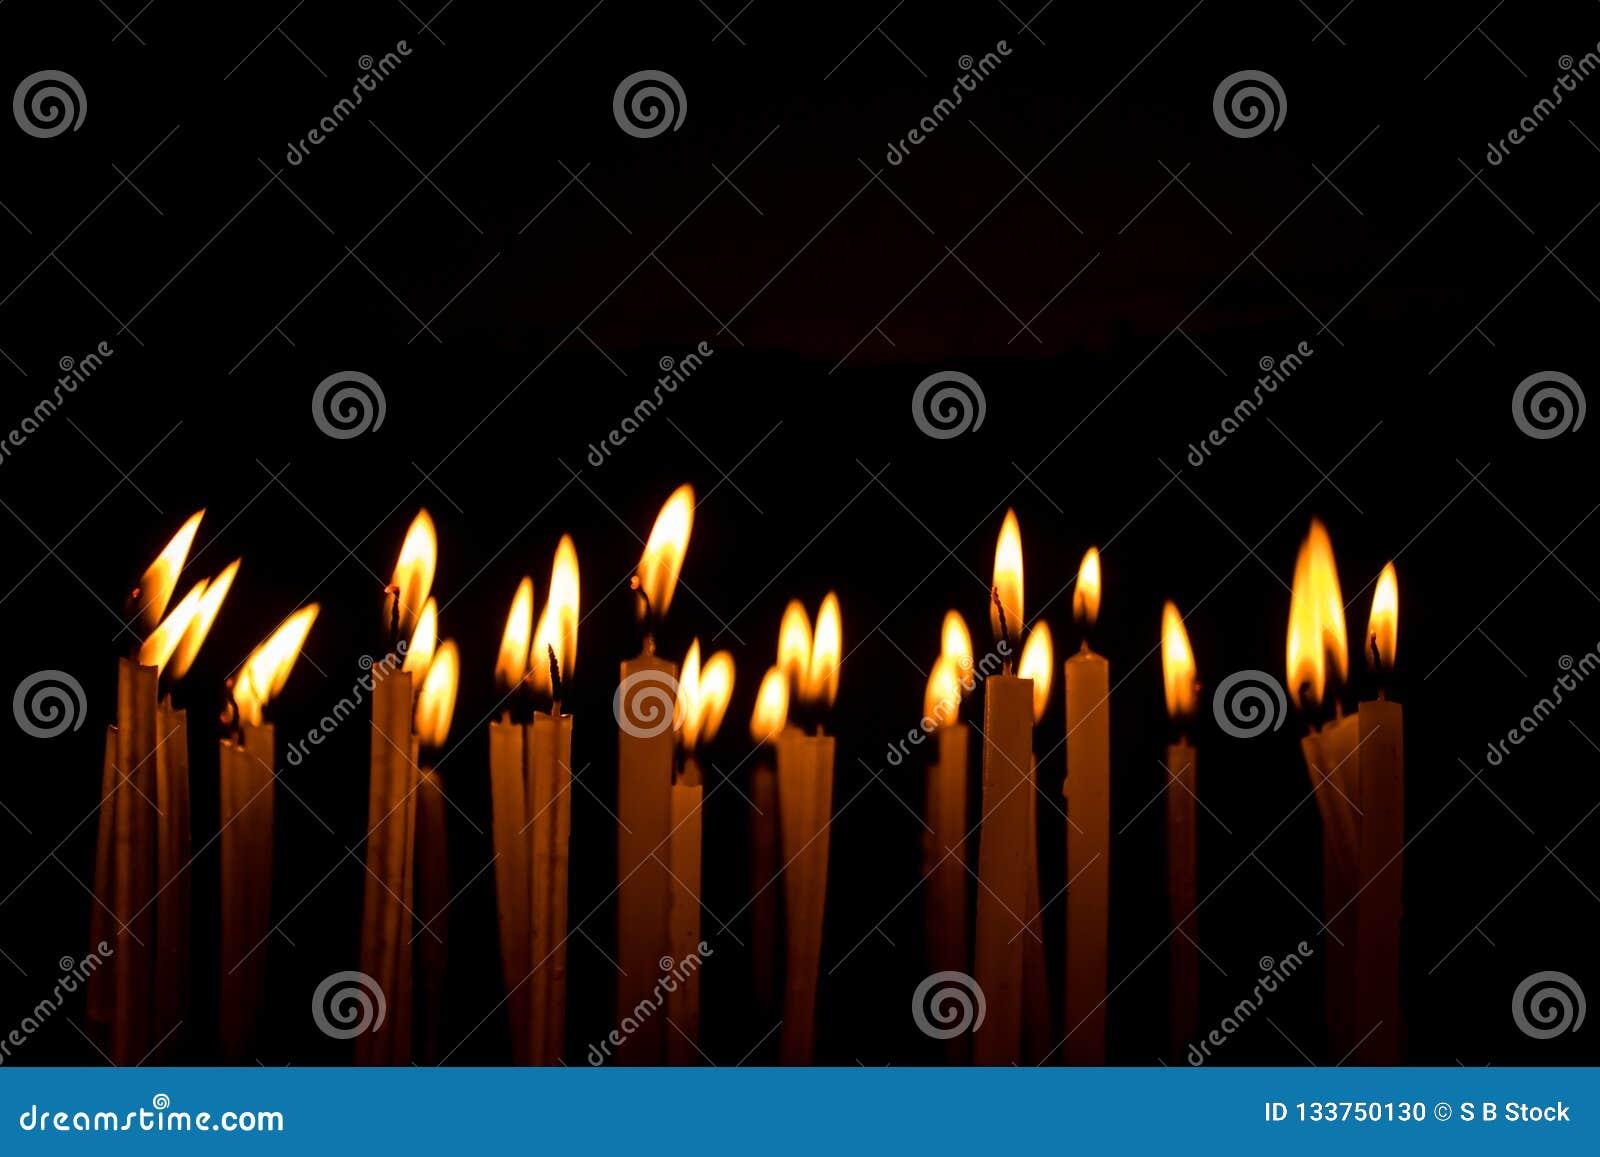 Many christmas candles burning at night on the black background